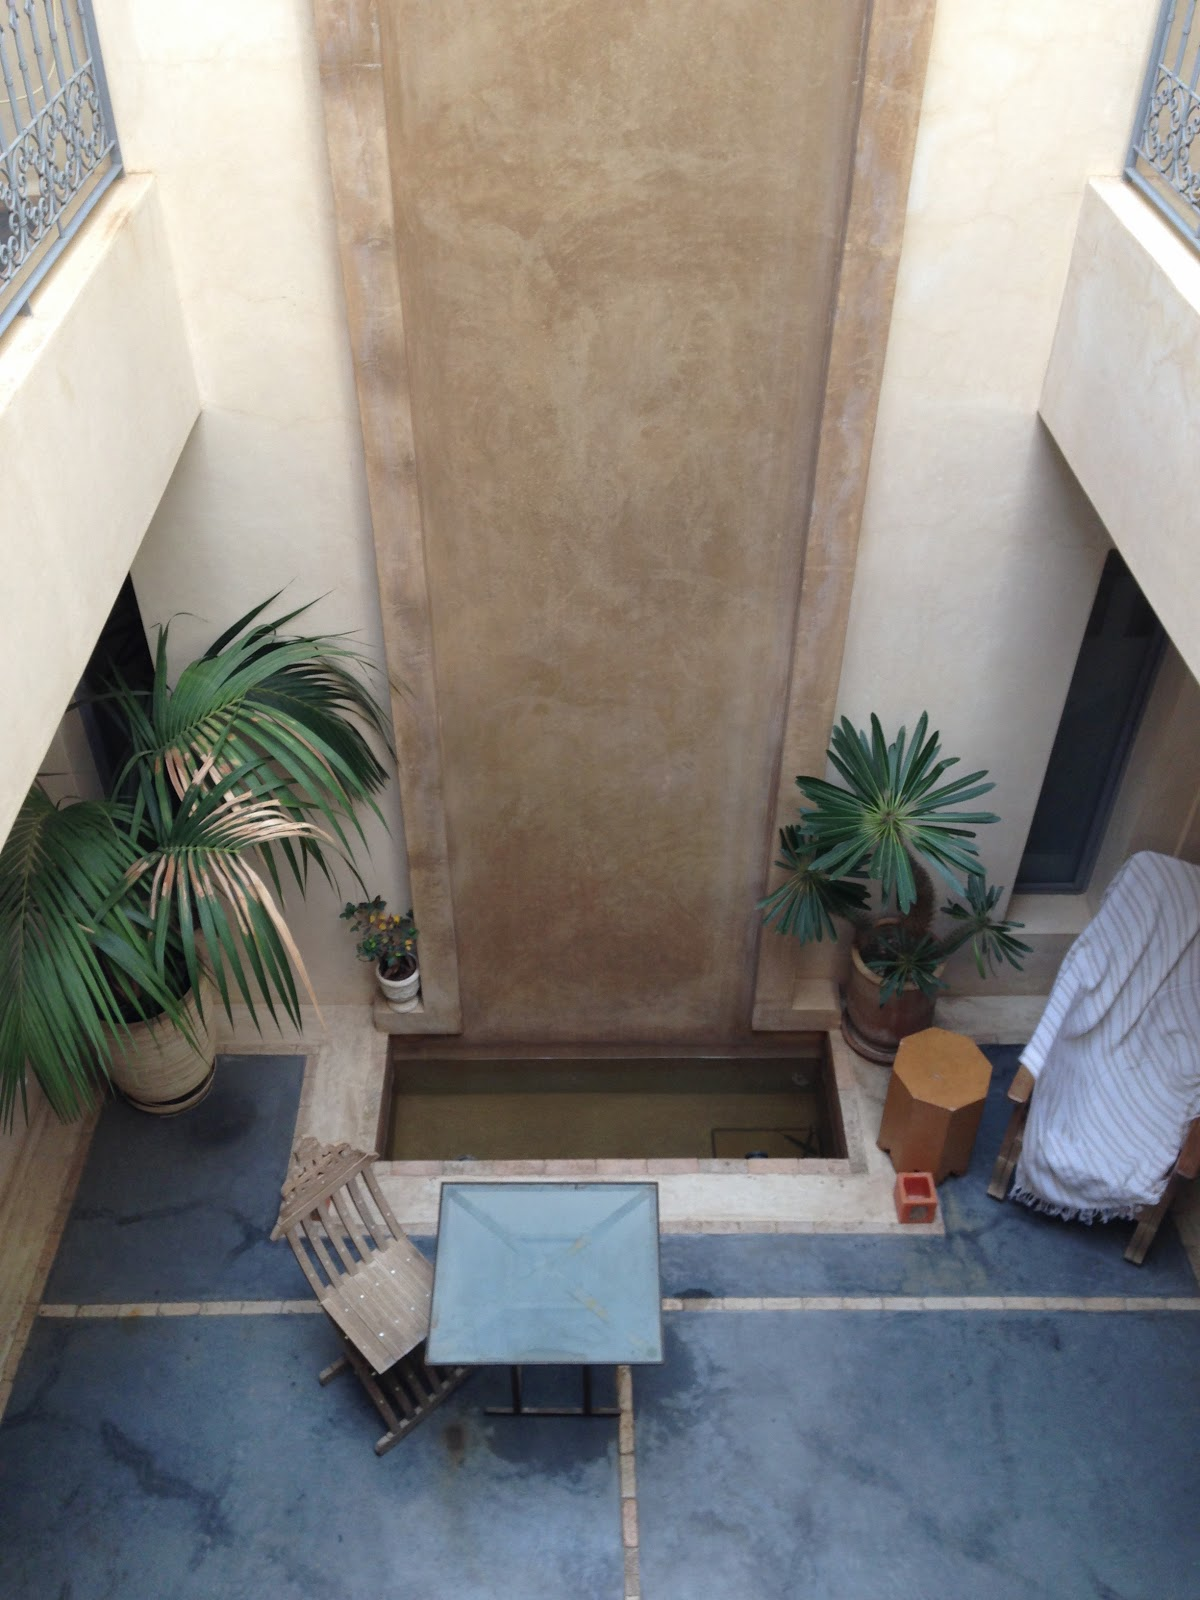 http://www.tripadvisor.fr/Hotel_Review-g293734-d1464952-Reviews-s1-Riad_Dar_More-Marrakech_Marrakech_Tensift_El_Haouz_Region.html